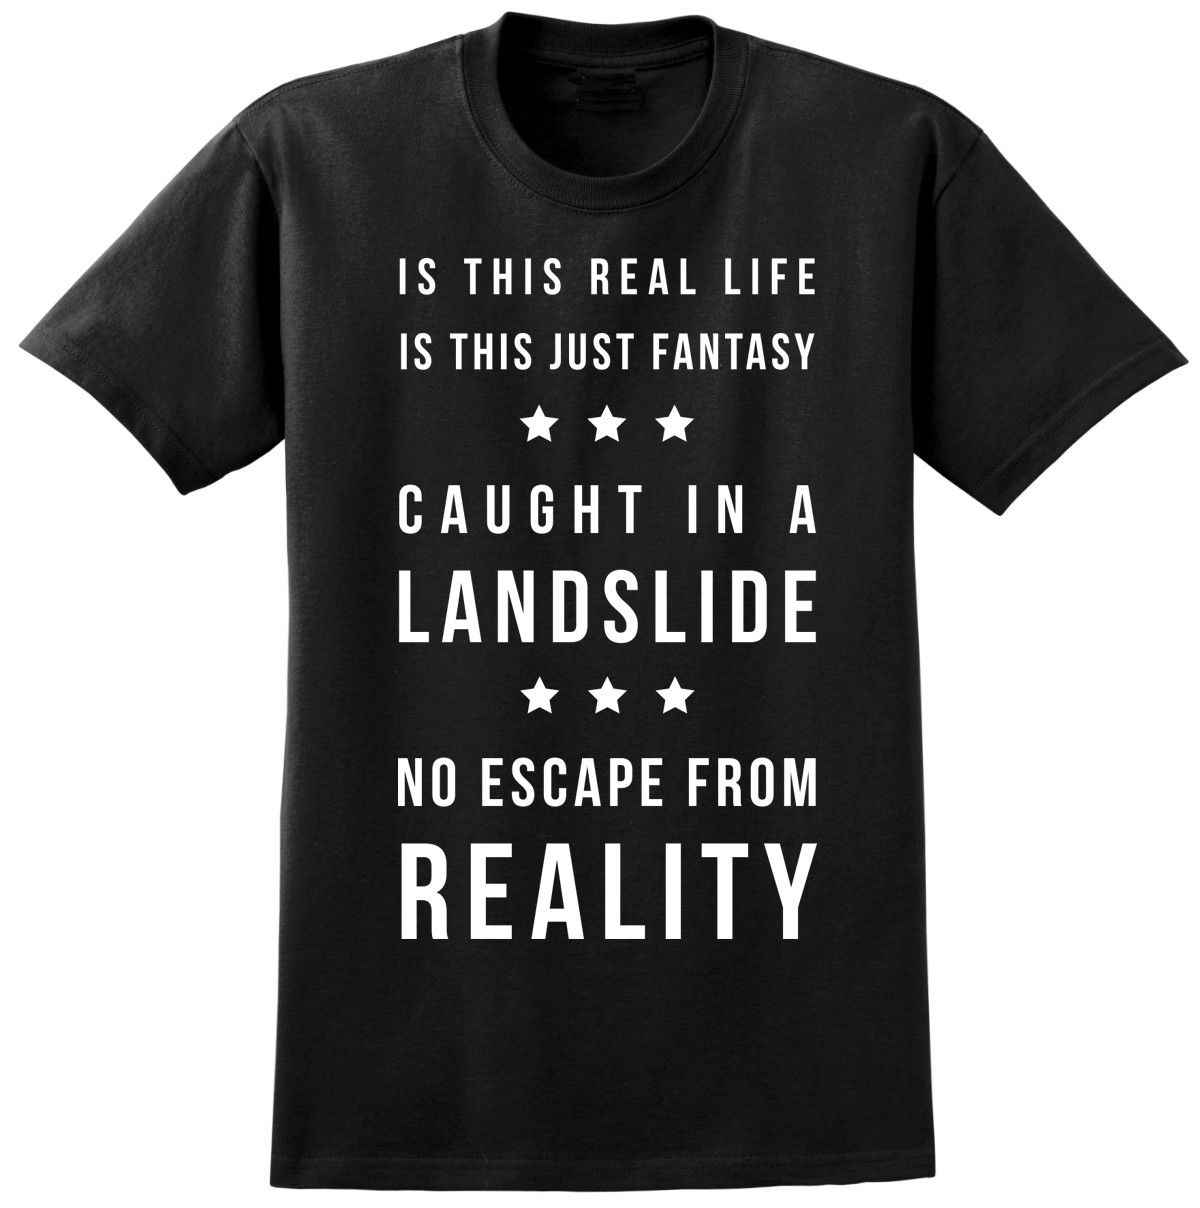 1ded1832 ... Queen Bohemian Rhapsody Music Lyrics T-shirt - Freddie Mercury Inspired  Tee Mens Shirts Short